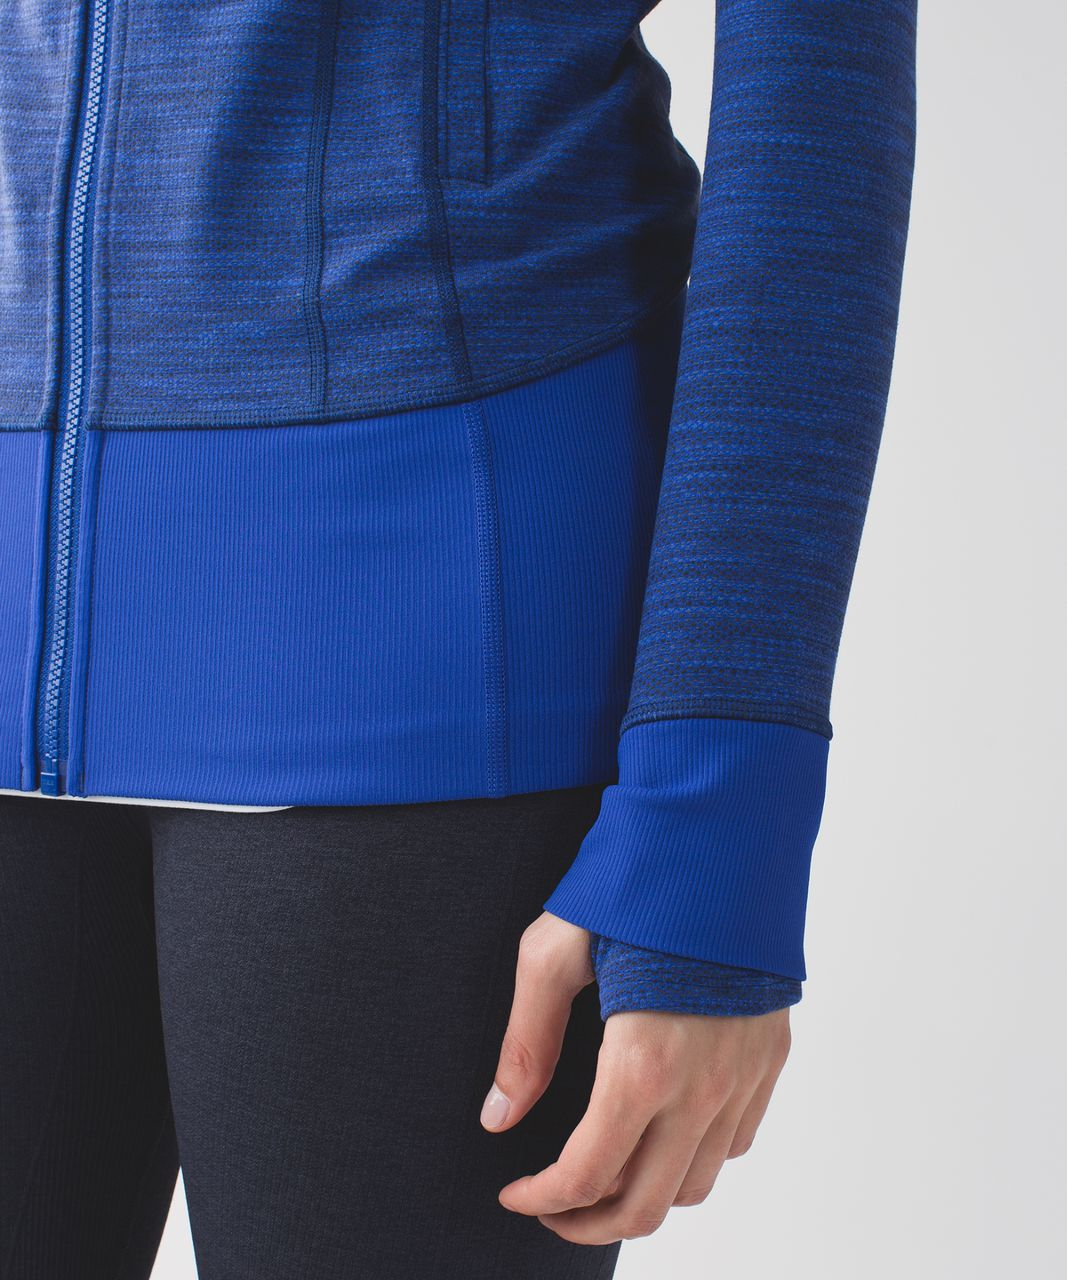 Lululemon Daily Practice Jacket - Diamond Jacquard Space Dye Sapphire Blue Naval Blue / Sapphire Blue